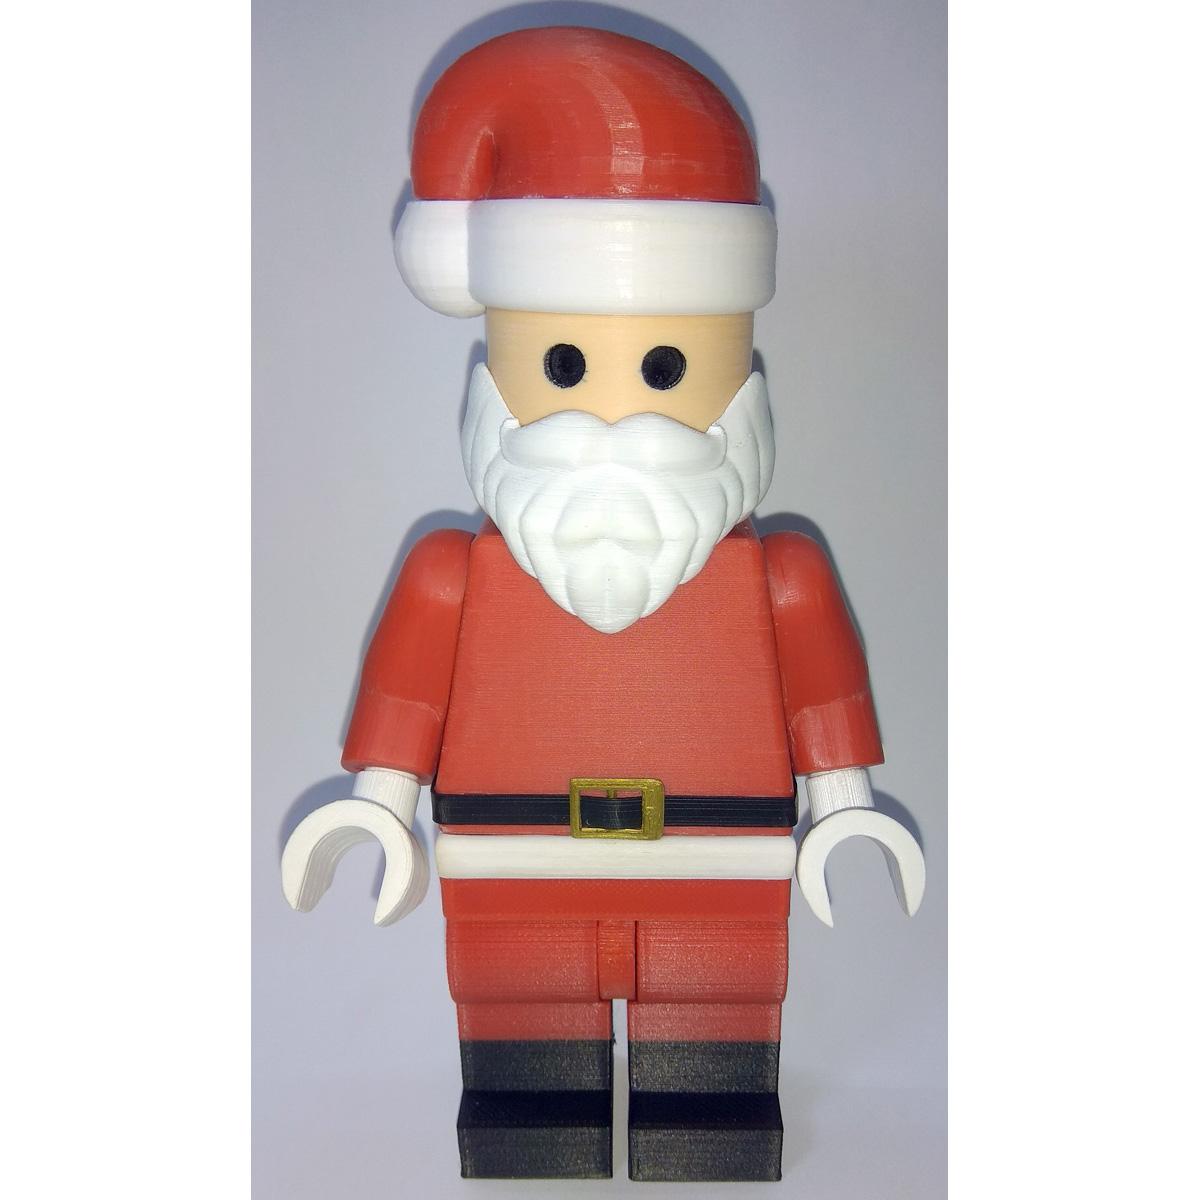 Lego_Minifig_-_Santa_Clause_4.jpg Download free STL file Jumbo Christmas - Santa Claus • 3D printer template, HowardB